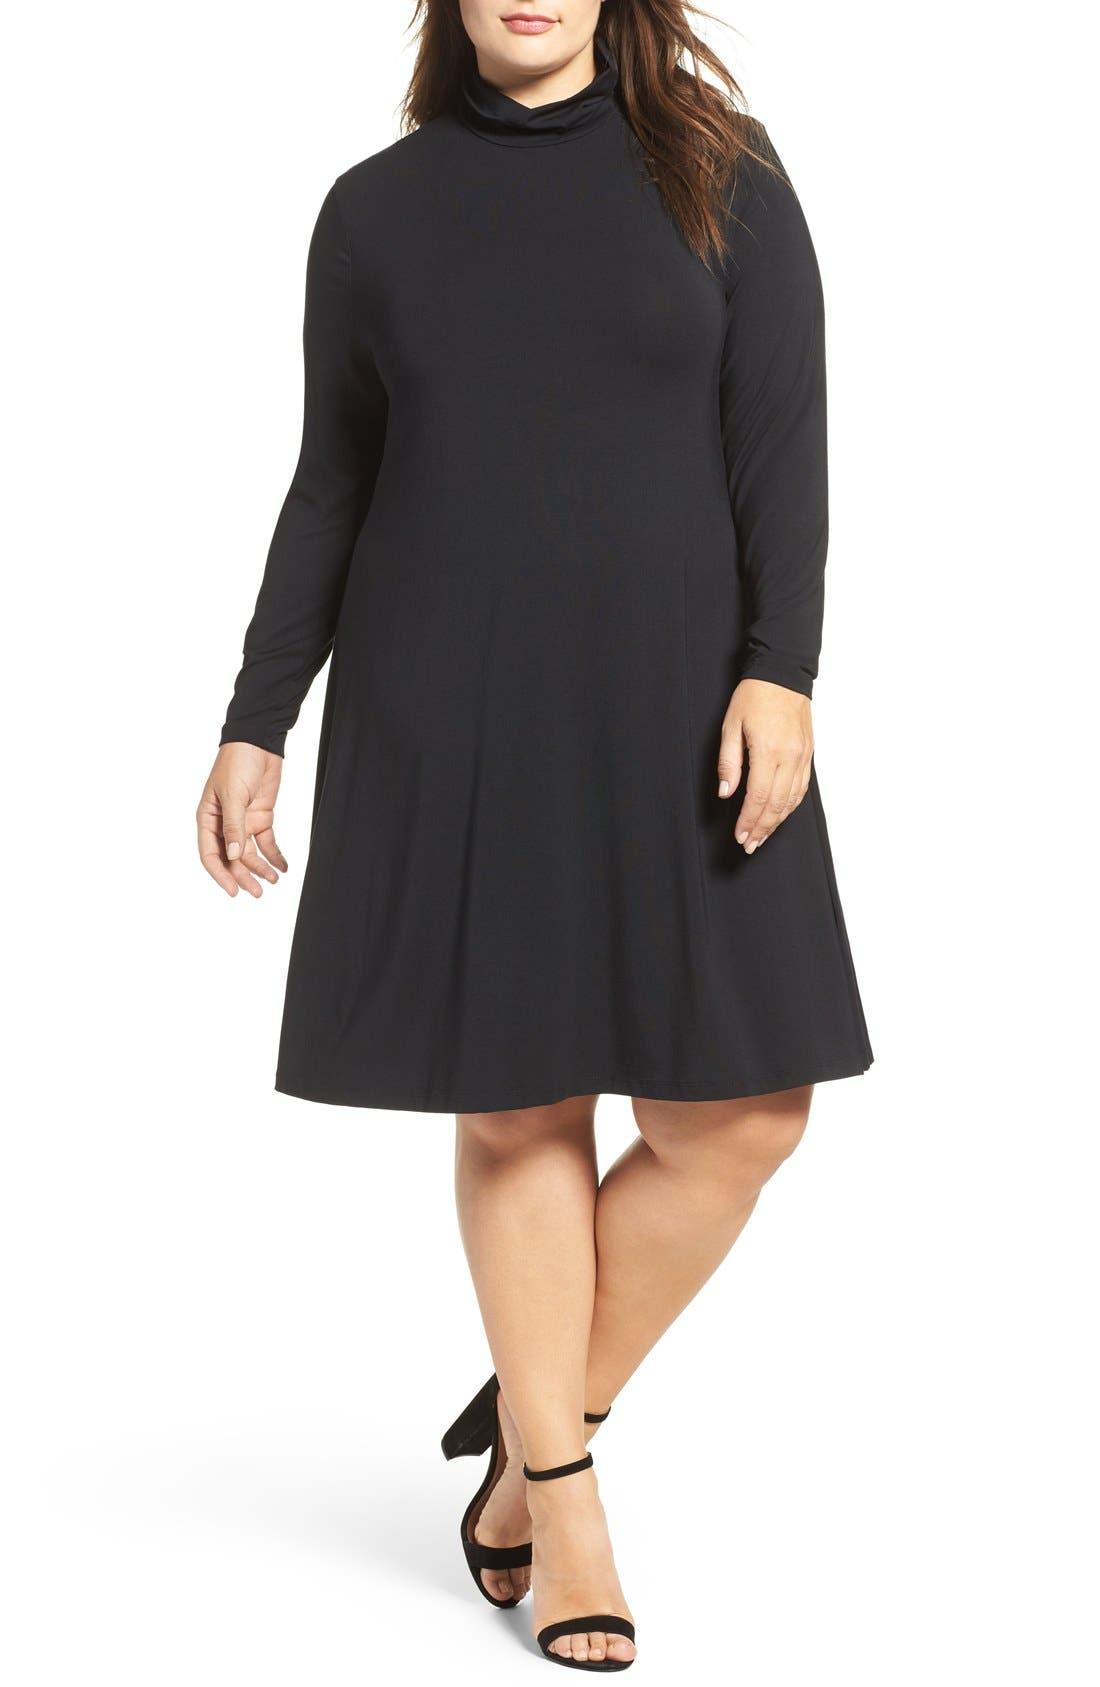 Sally Turtleneck A-Line Dress,                         Main,                         color, Black